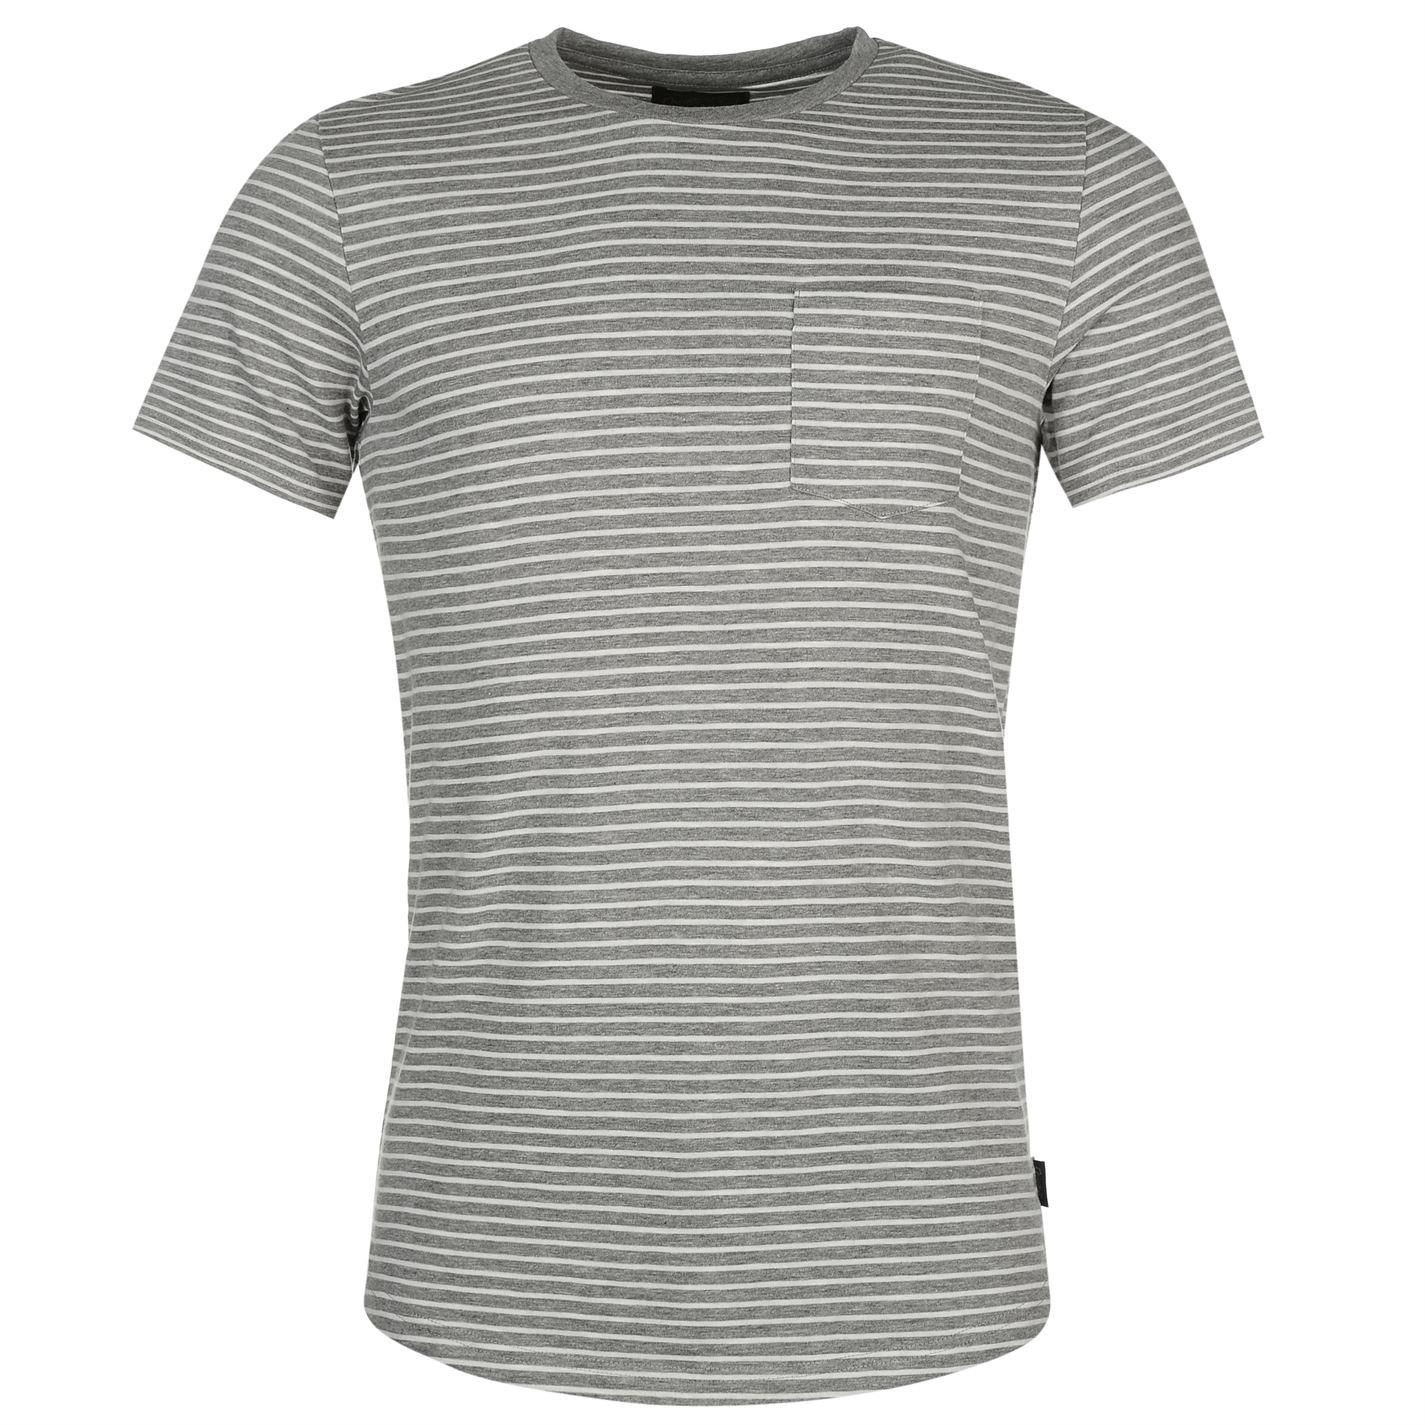 Jack y Jones Hombre Originals Berlin Camiseta Camisa Ropa Vestir ...